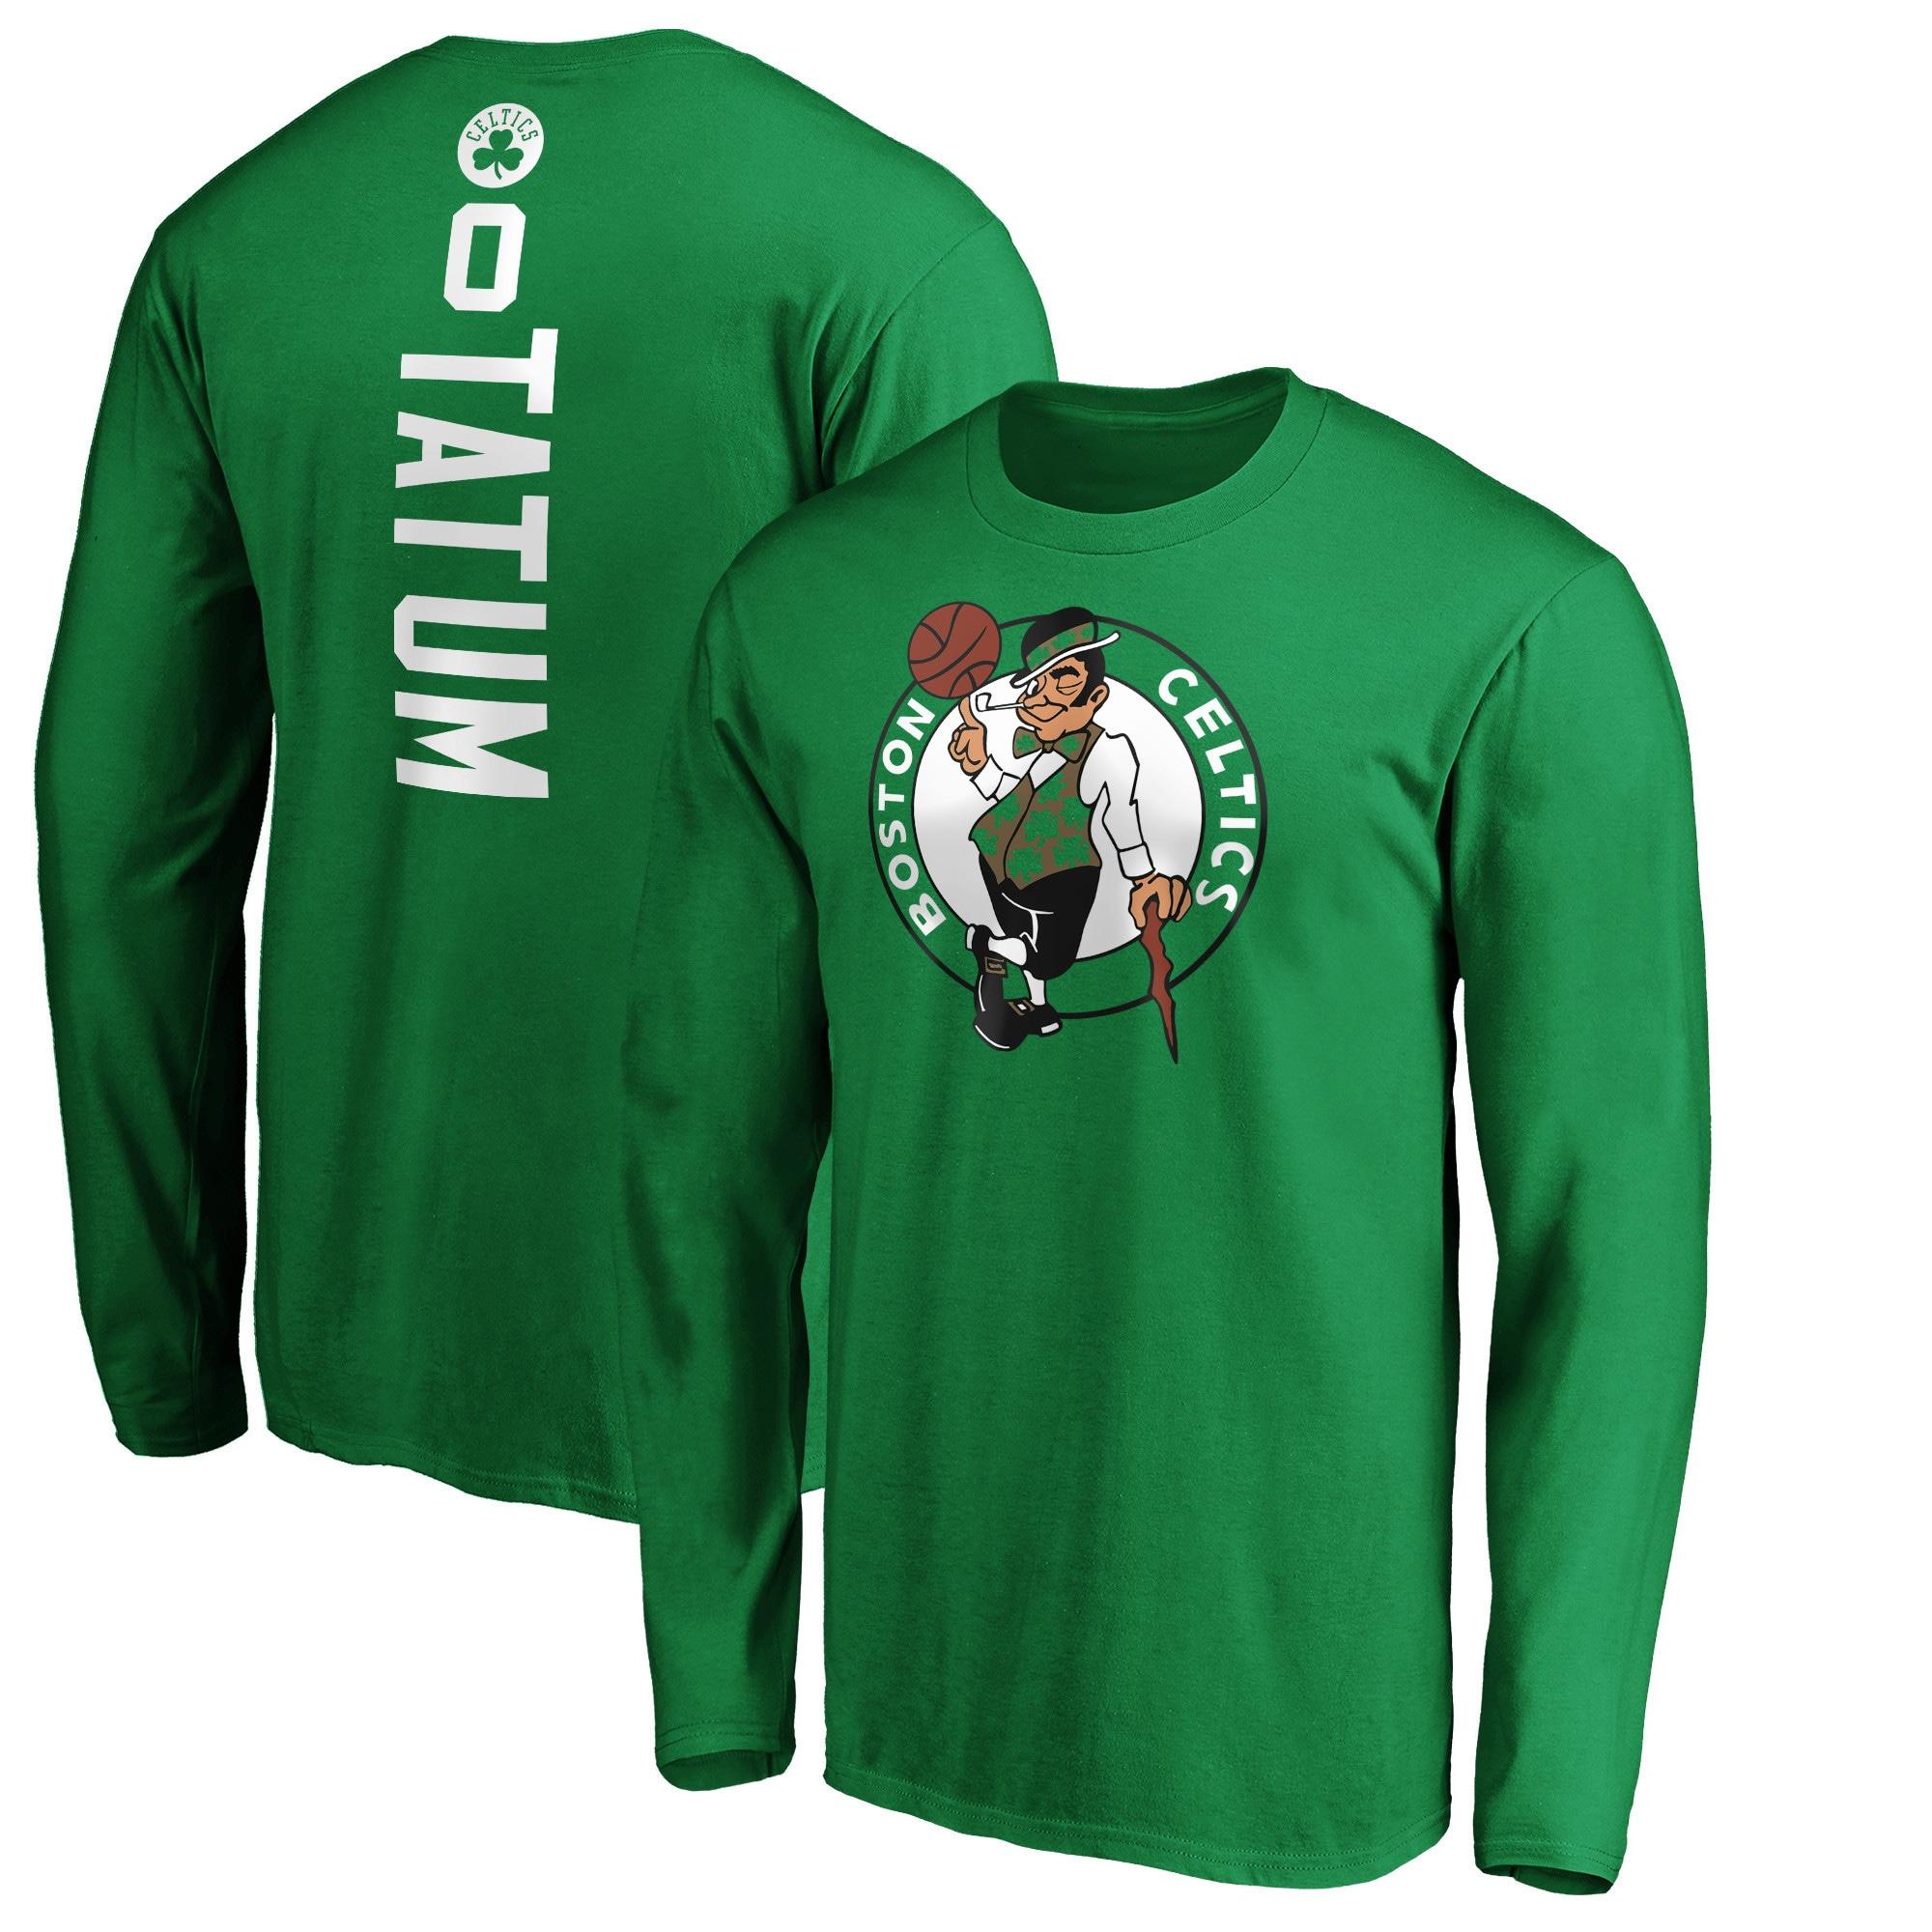 Boston Celtics Fanatics Branded Team Playmaker Name & Number Long Sleeve T-Shirt - Kelly Green